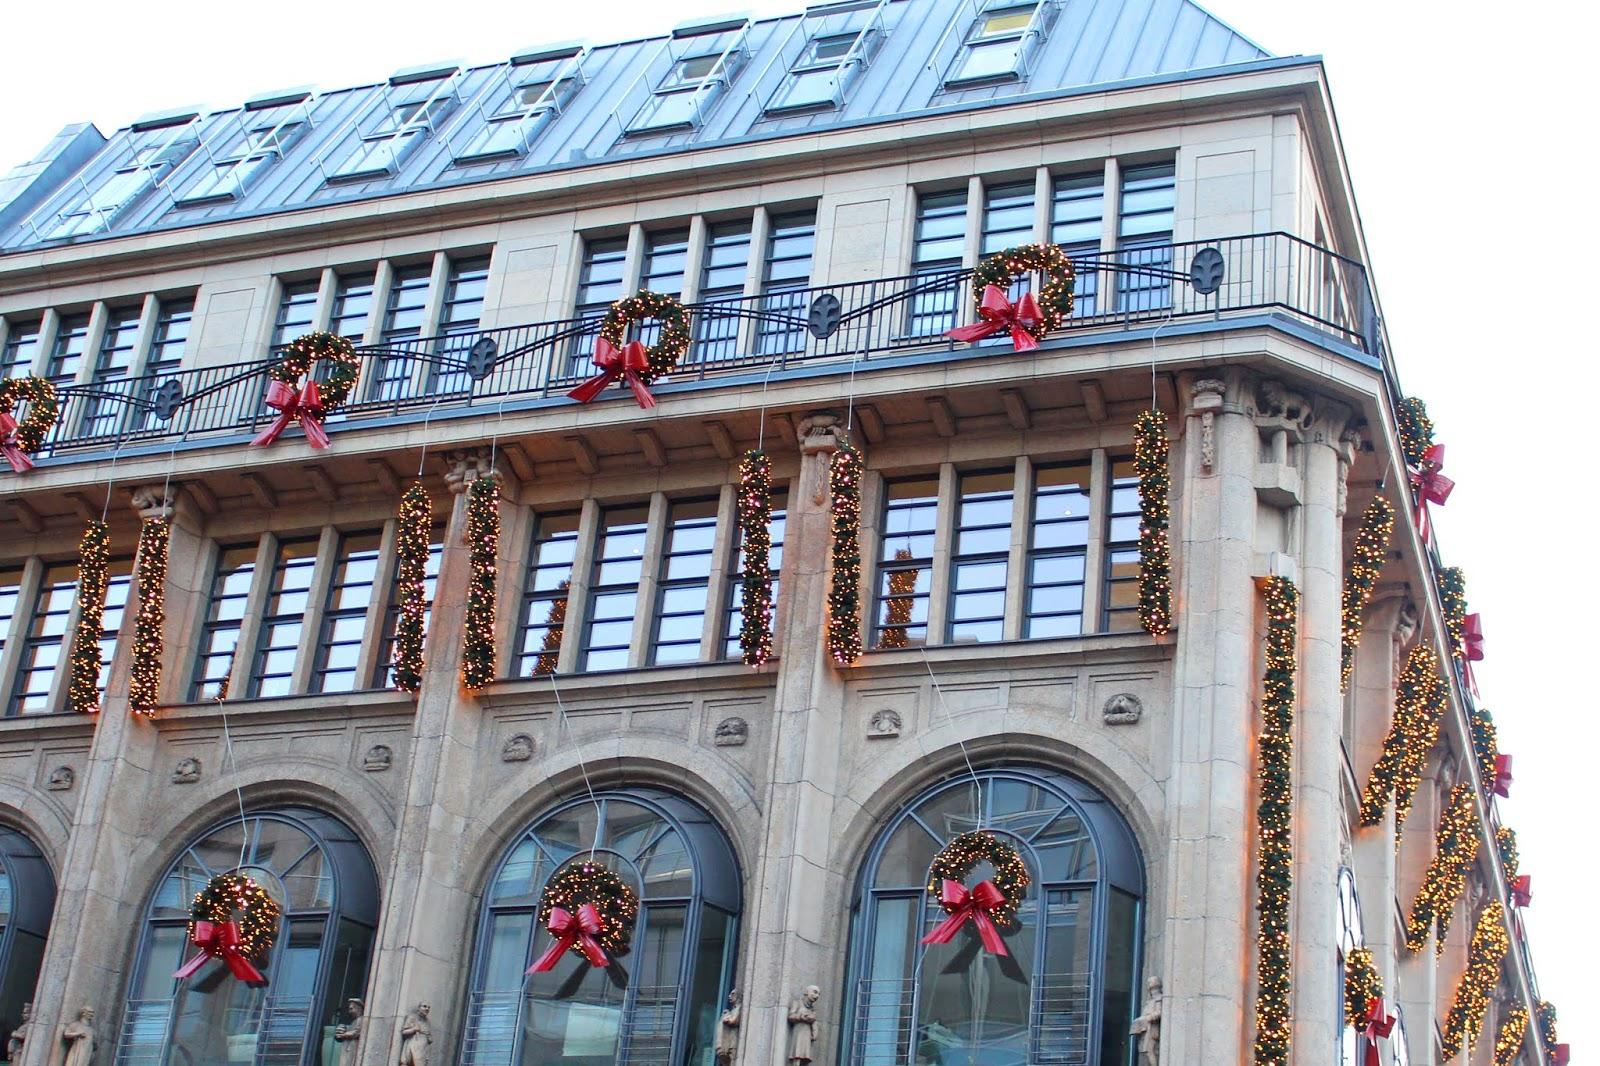 Berlin at Christmas - travel & lifestyle blog